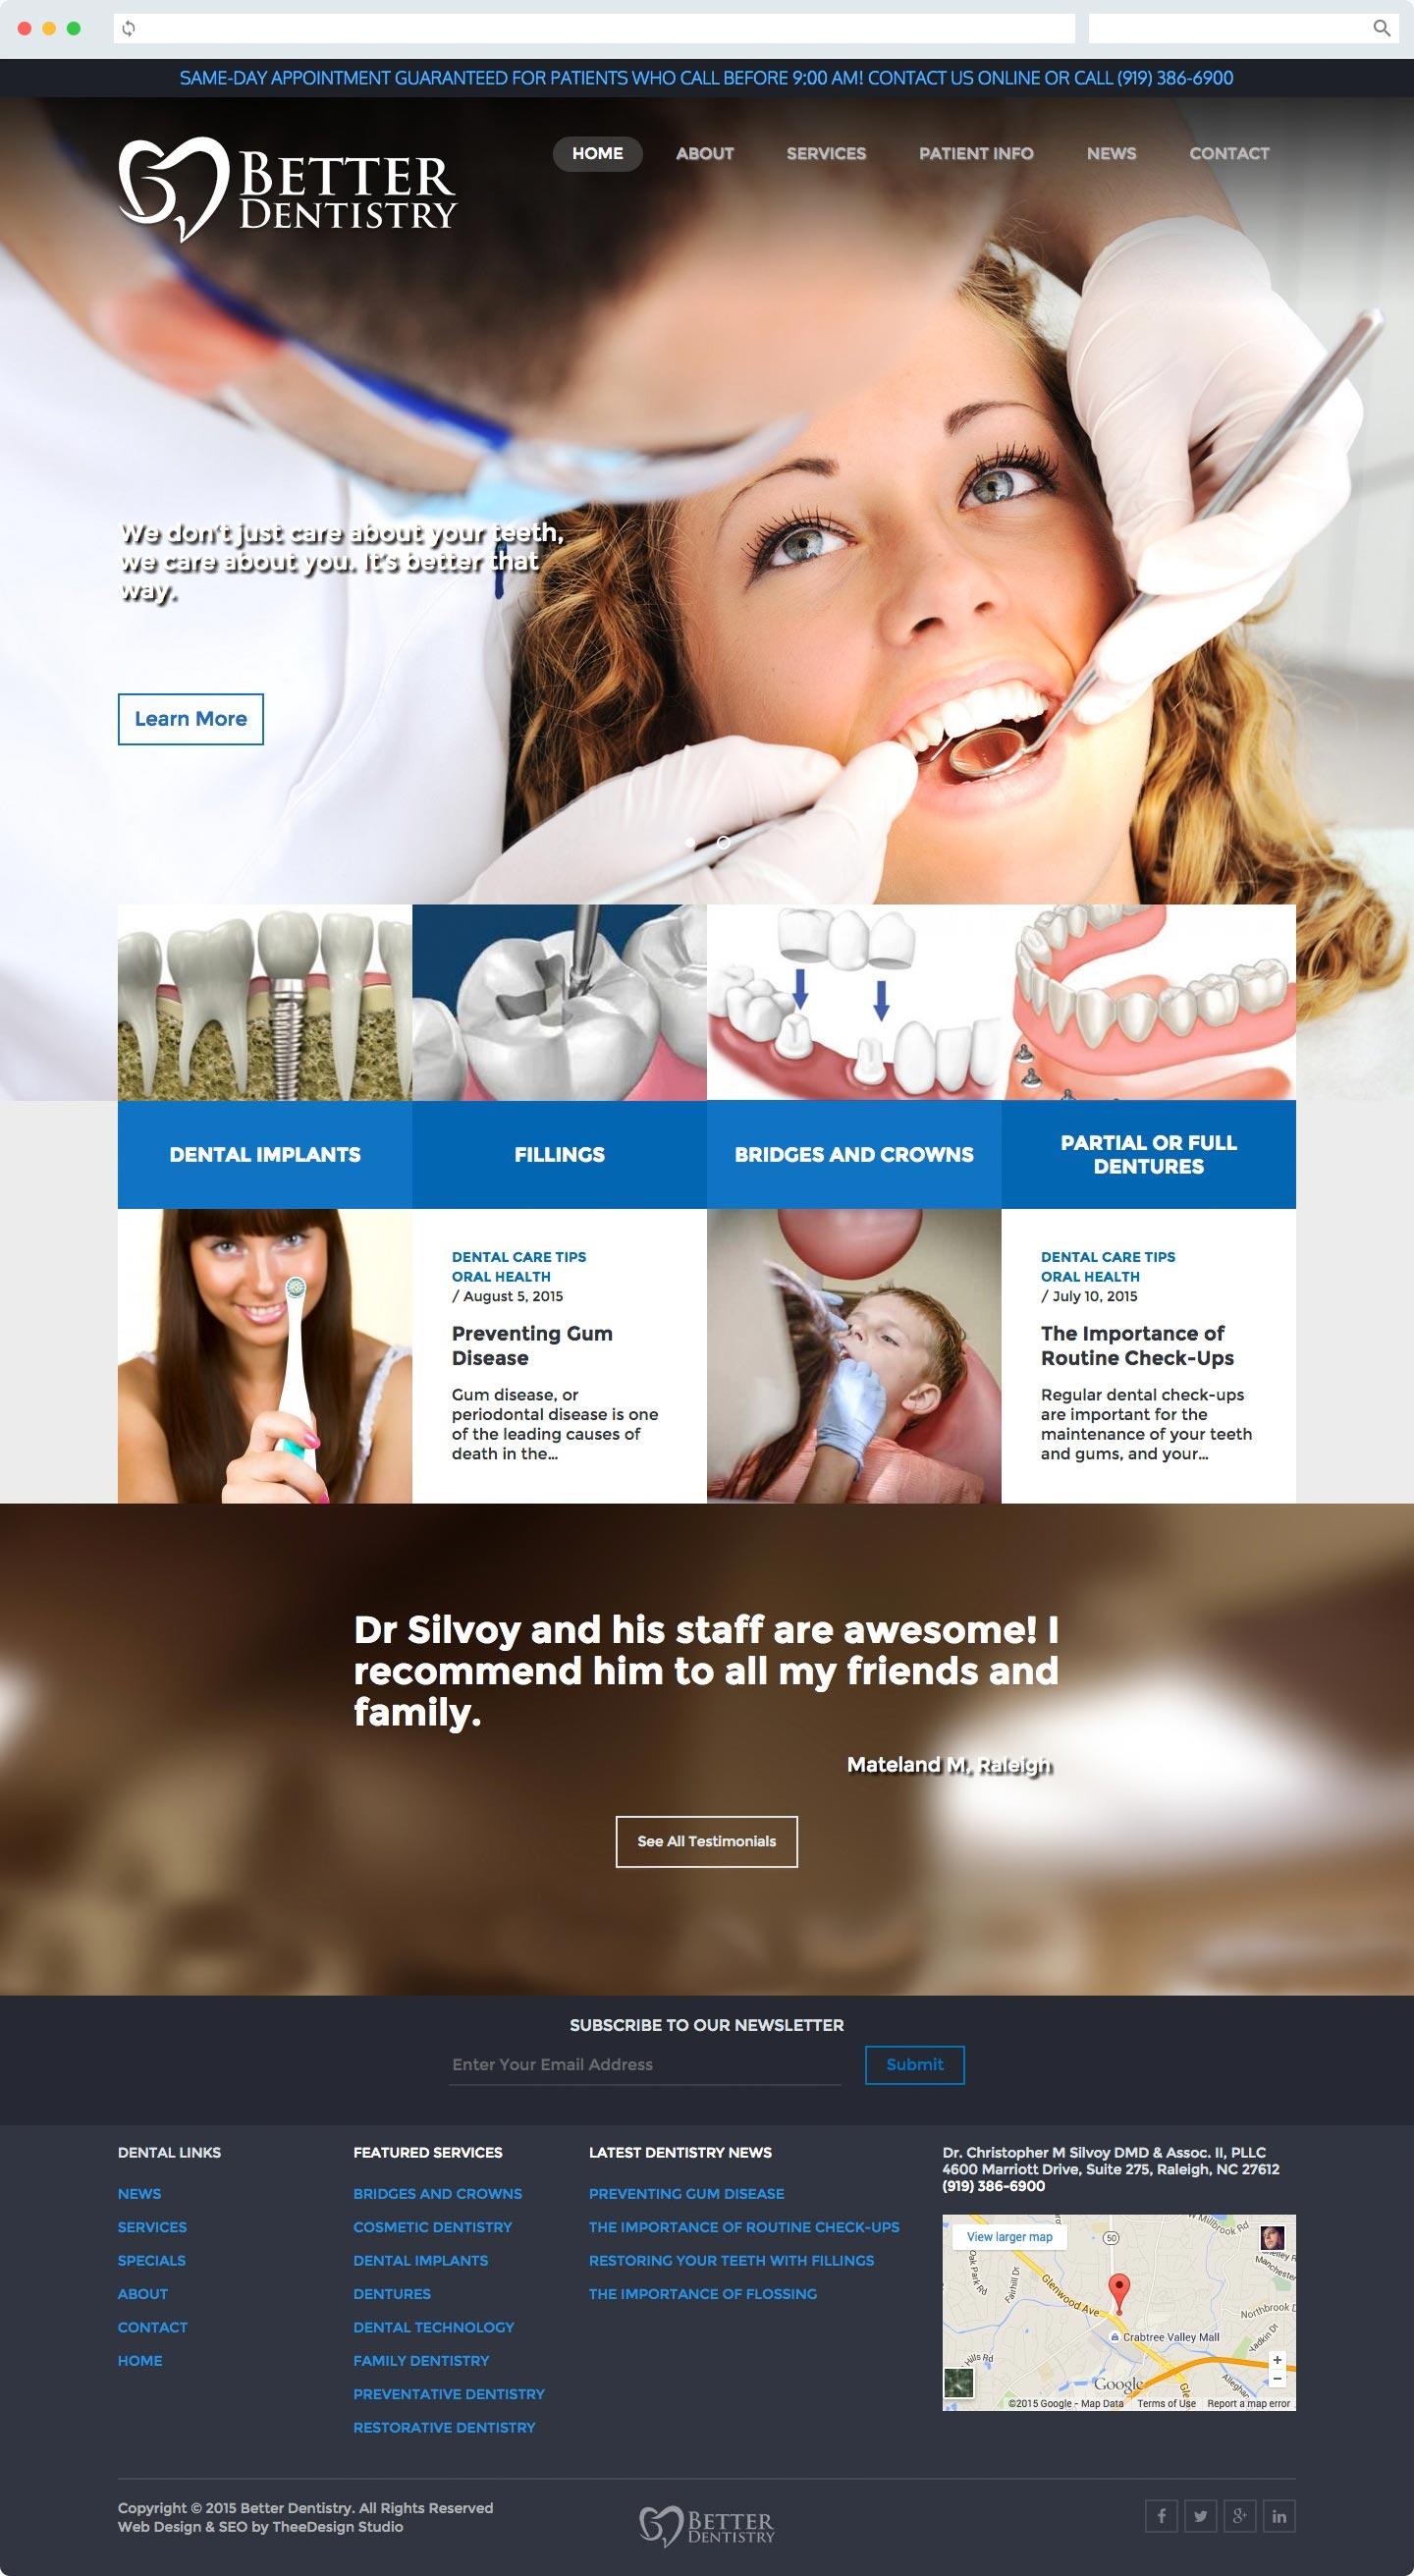 Dentist Web Design & SEO